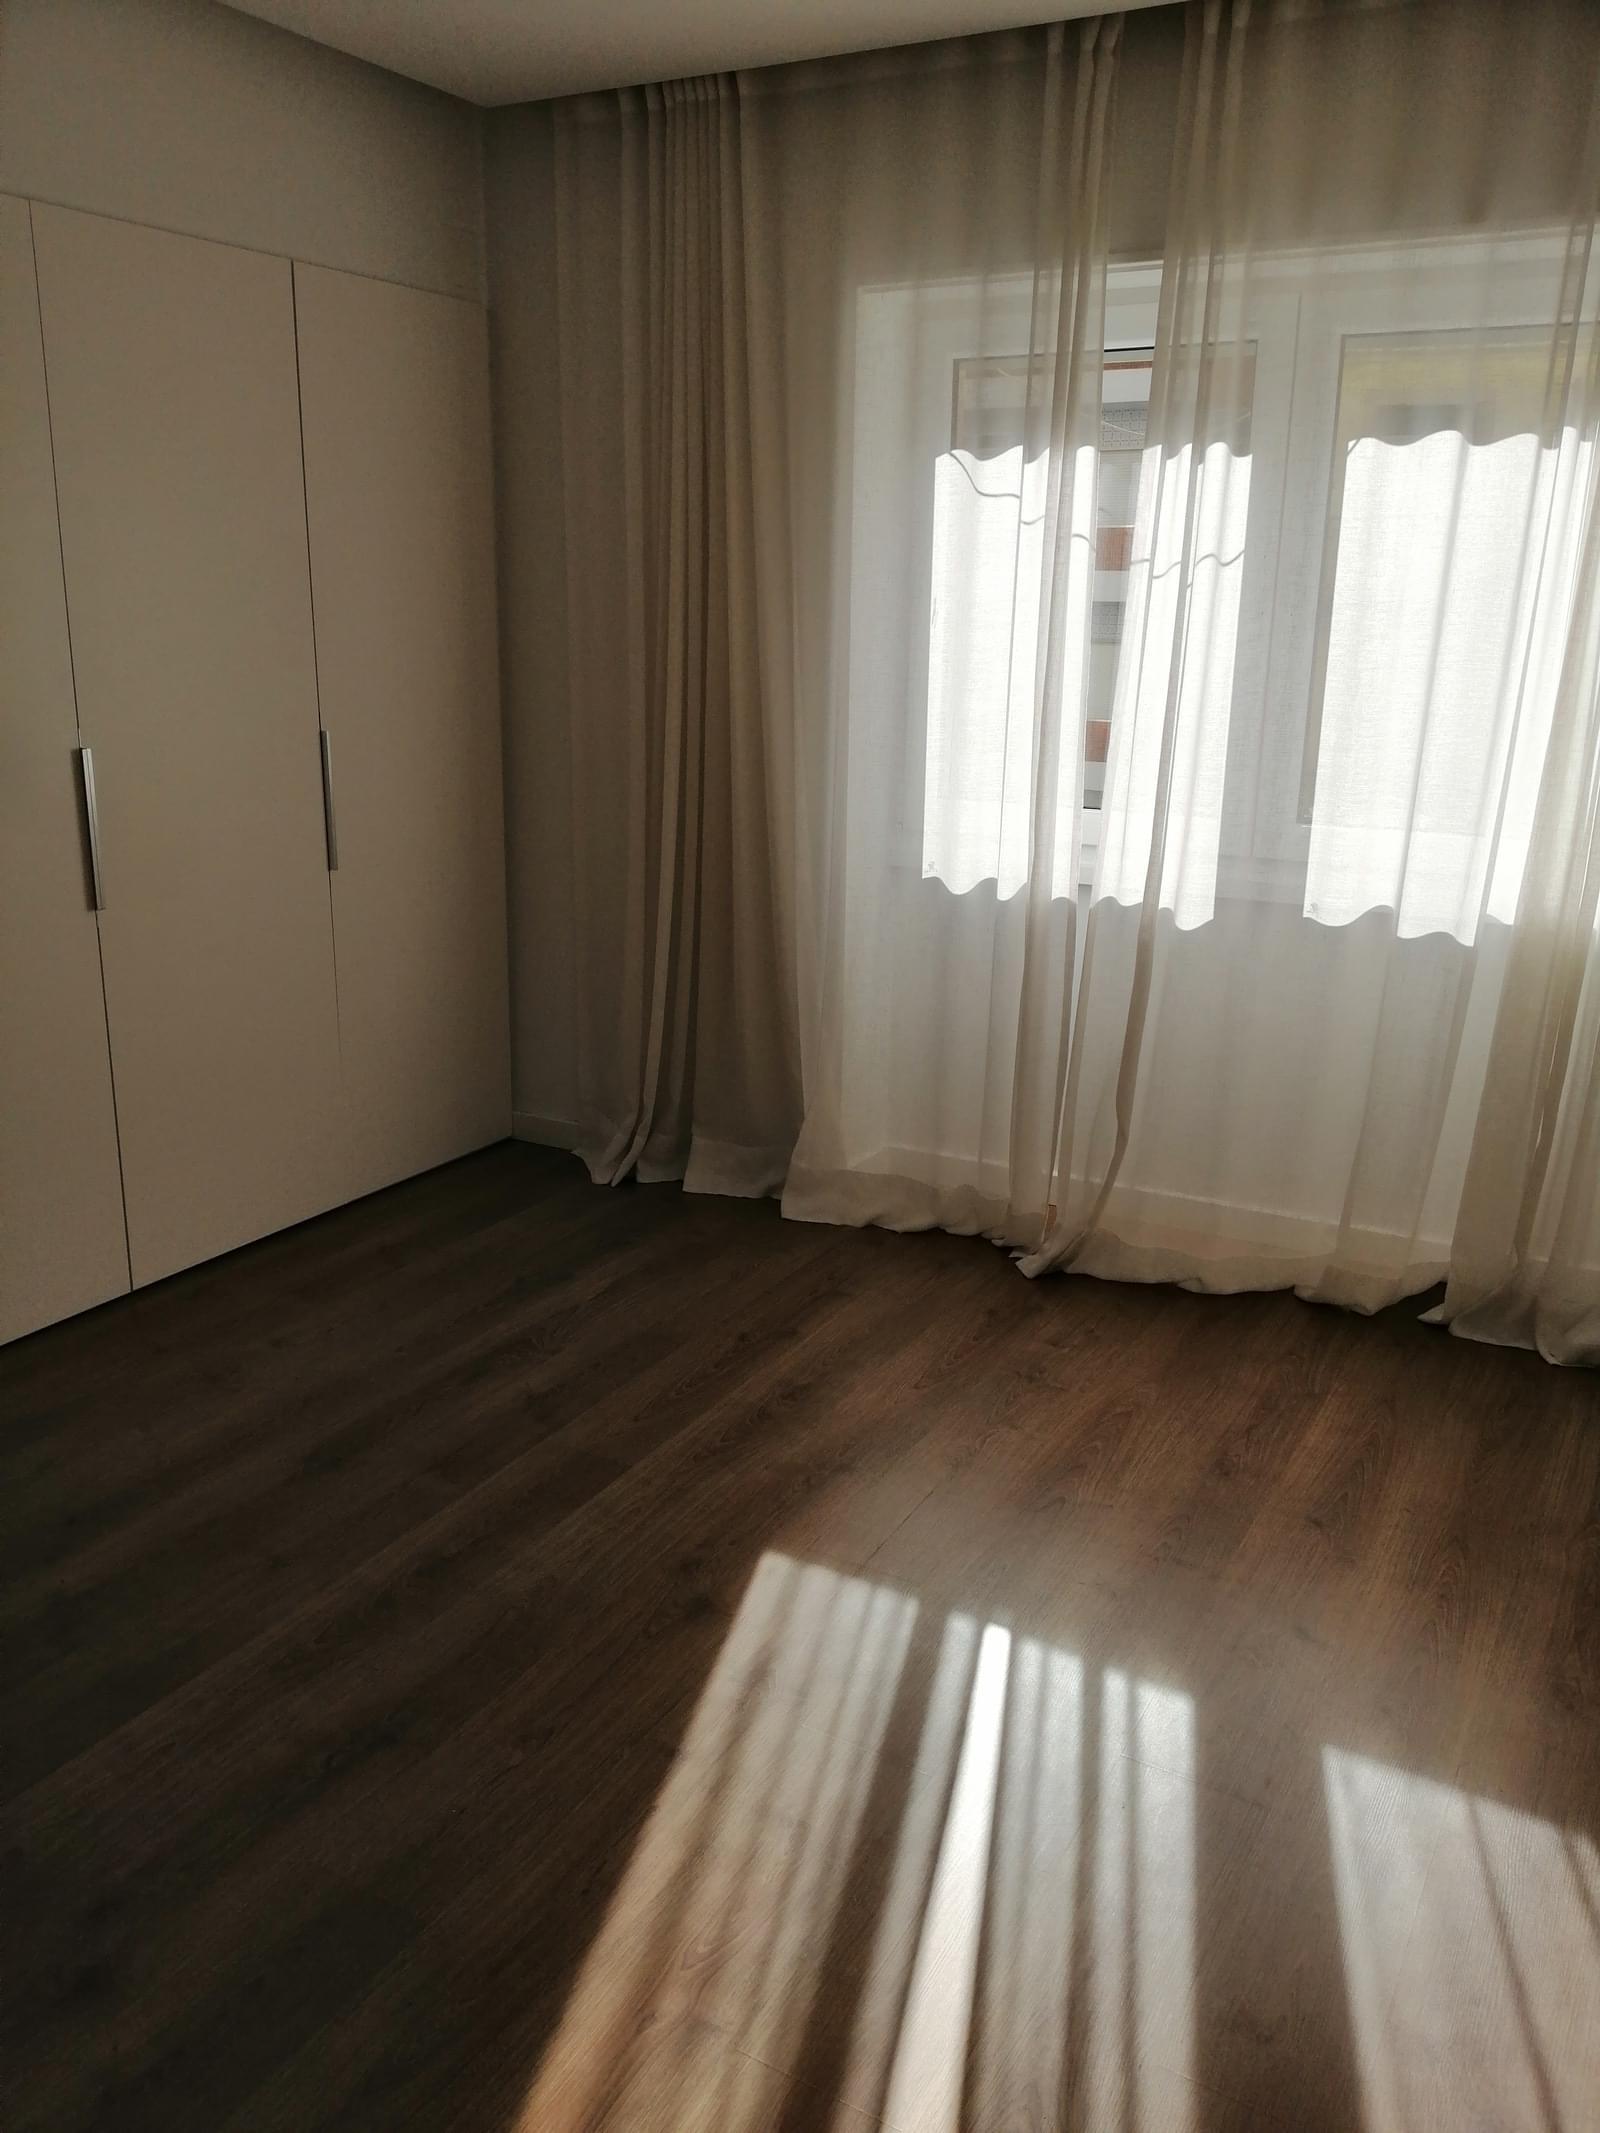 pf18996-apartamento-t3-lisboa-c3ce19c3-8294-47ef-990d-f97b49dc0002